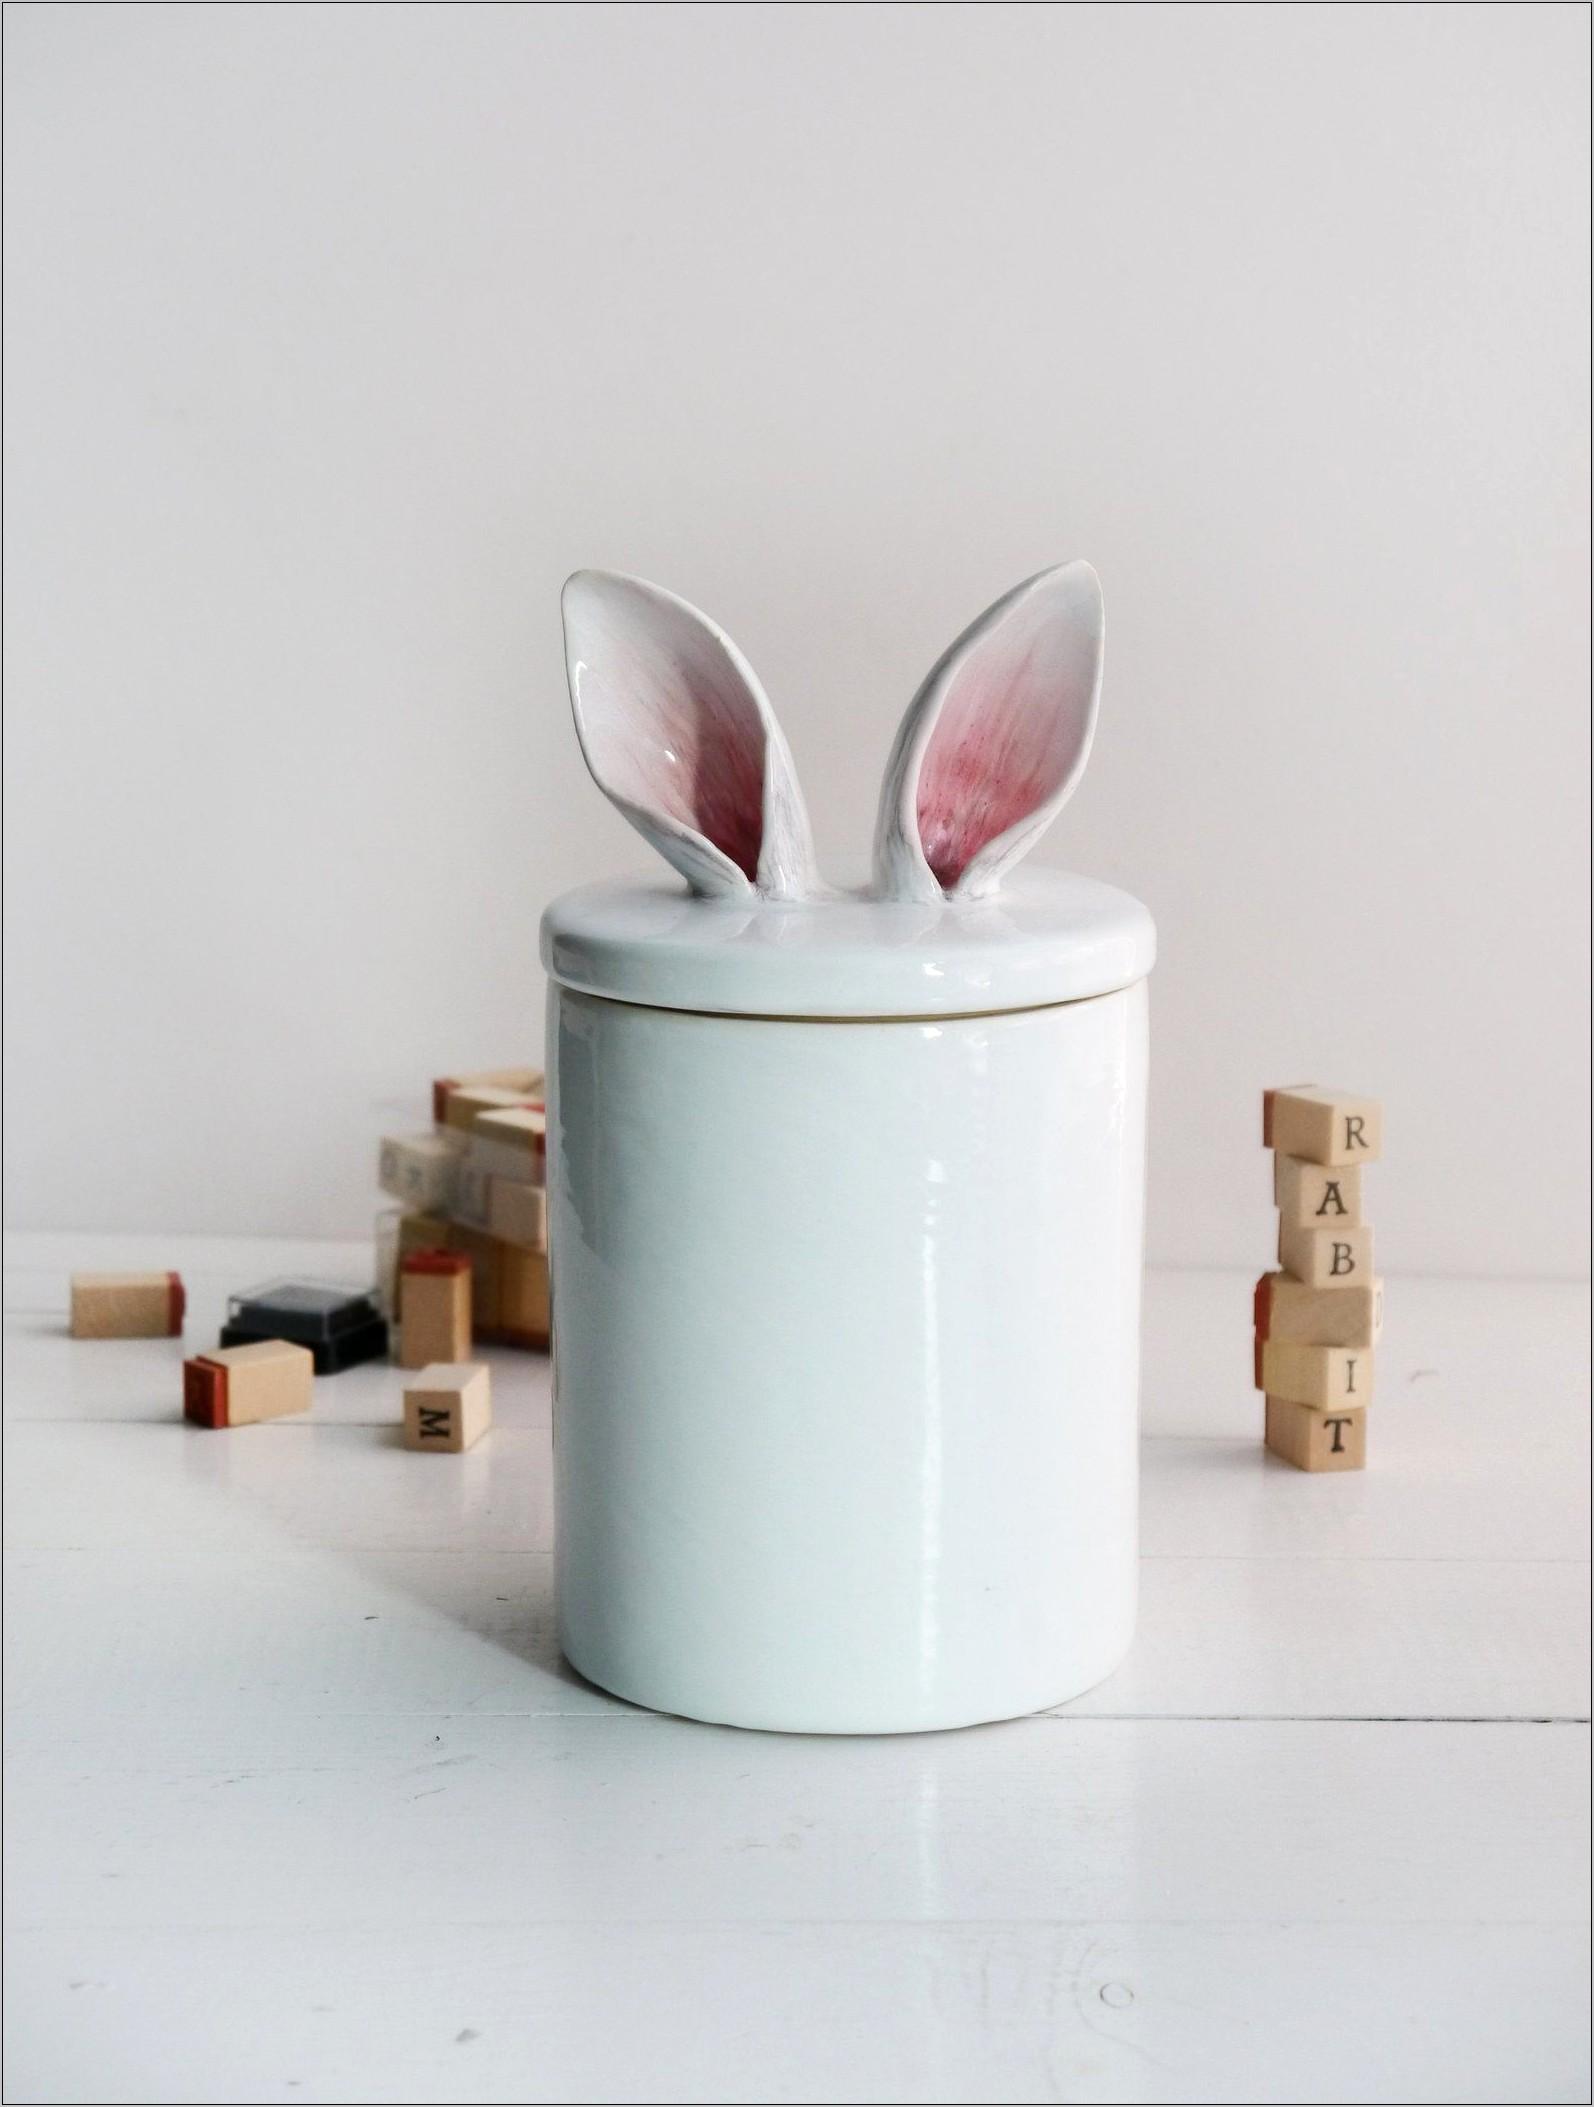 Ceramic Rabbit Kitchen Decoration